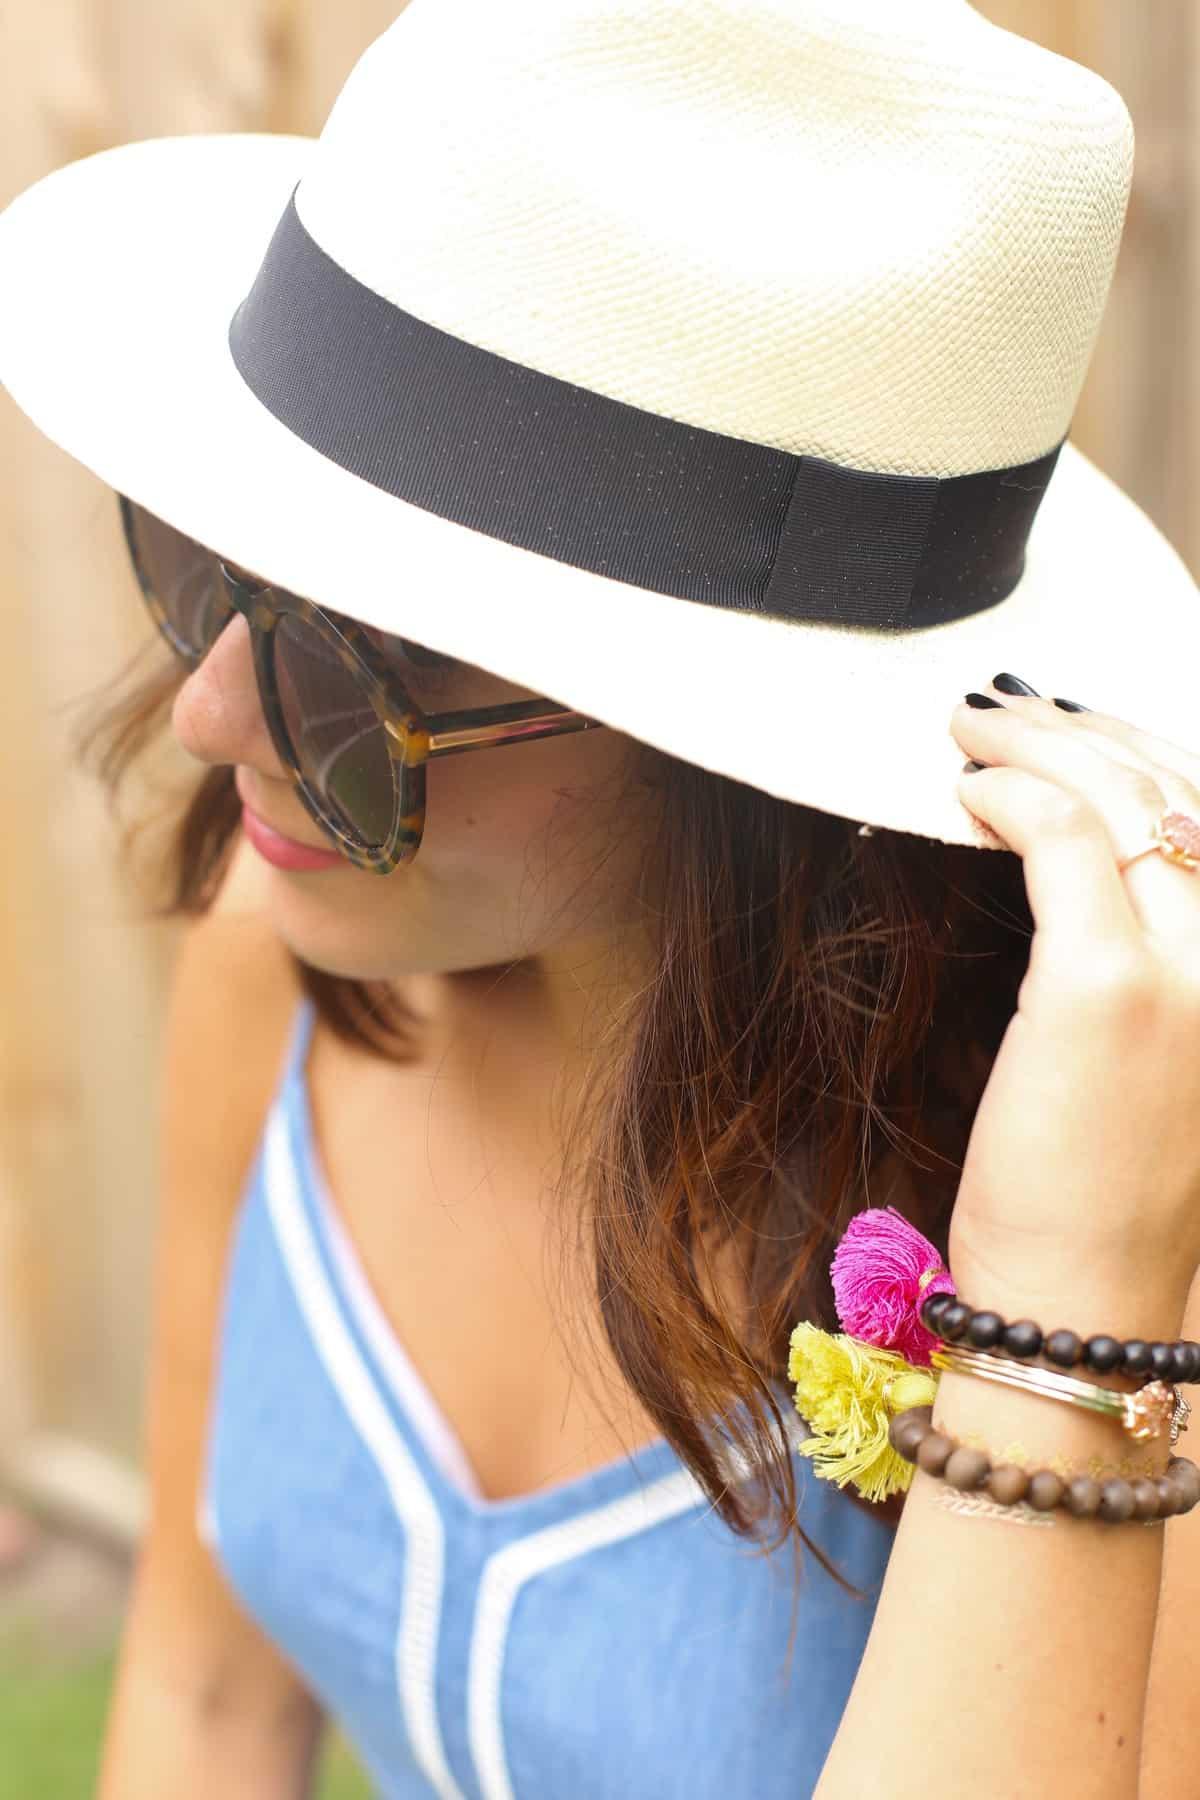 818d6d56f68 ... Chambray denim summer dress and panama hat via  mysytleivta Jessica  Camerata